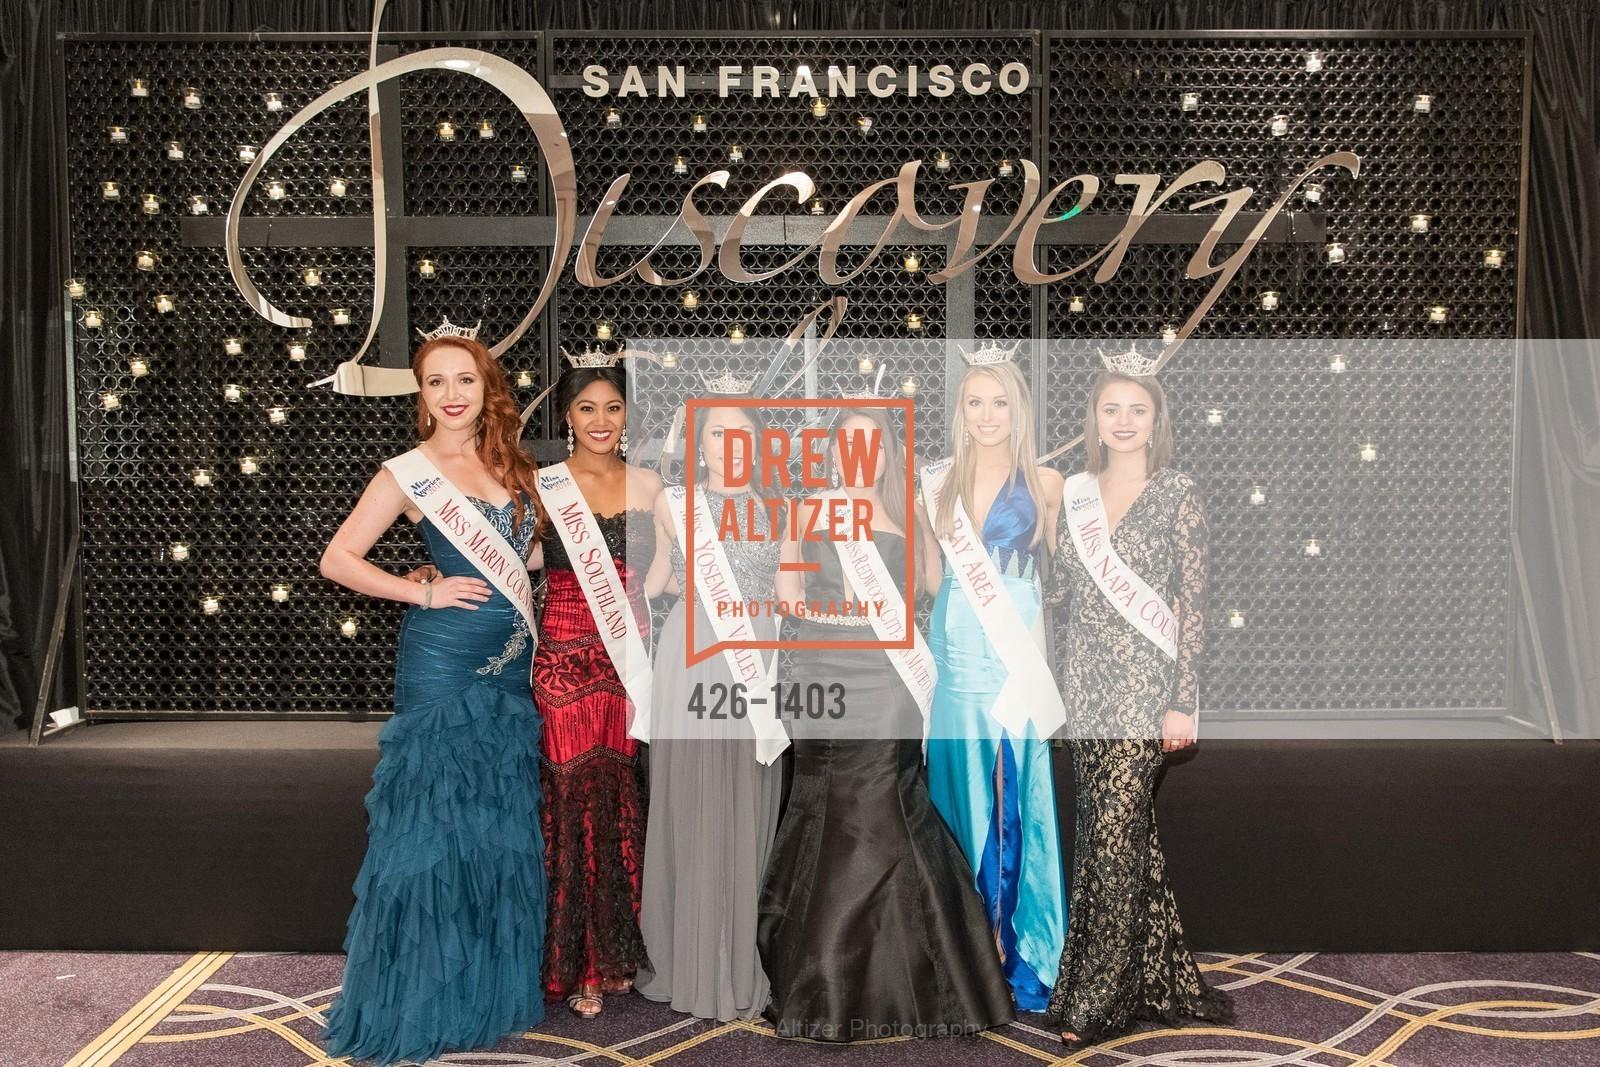 Haley Rome, Camille Dyquiangco, Heidi Cheung, Elyse Vincenzi, Julianna Johnson, Giselle Cisneros, Photo #426-1403